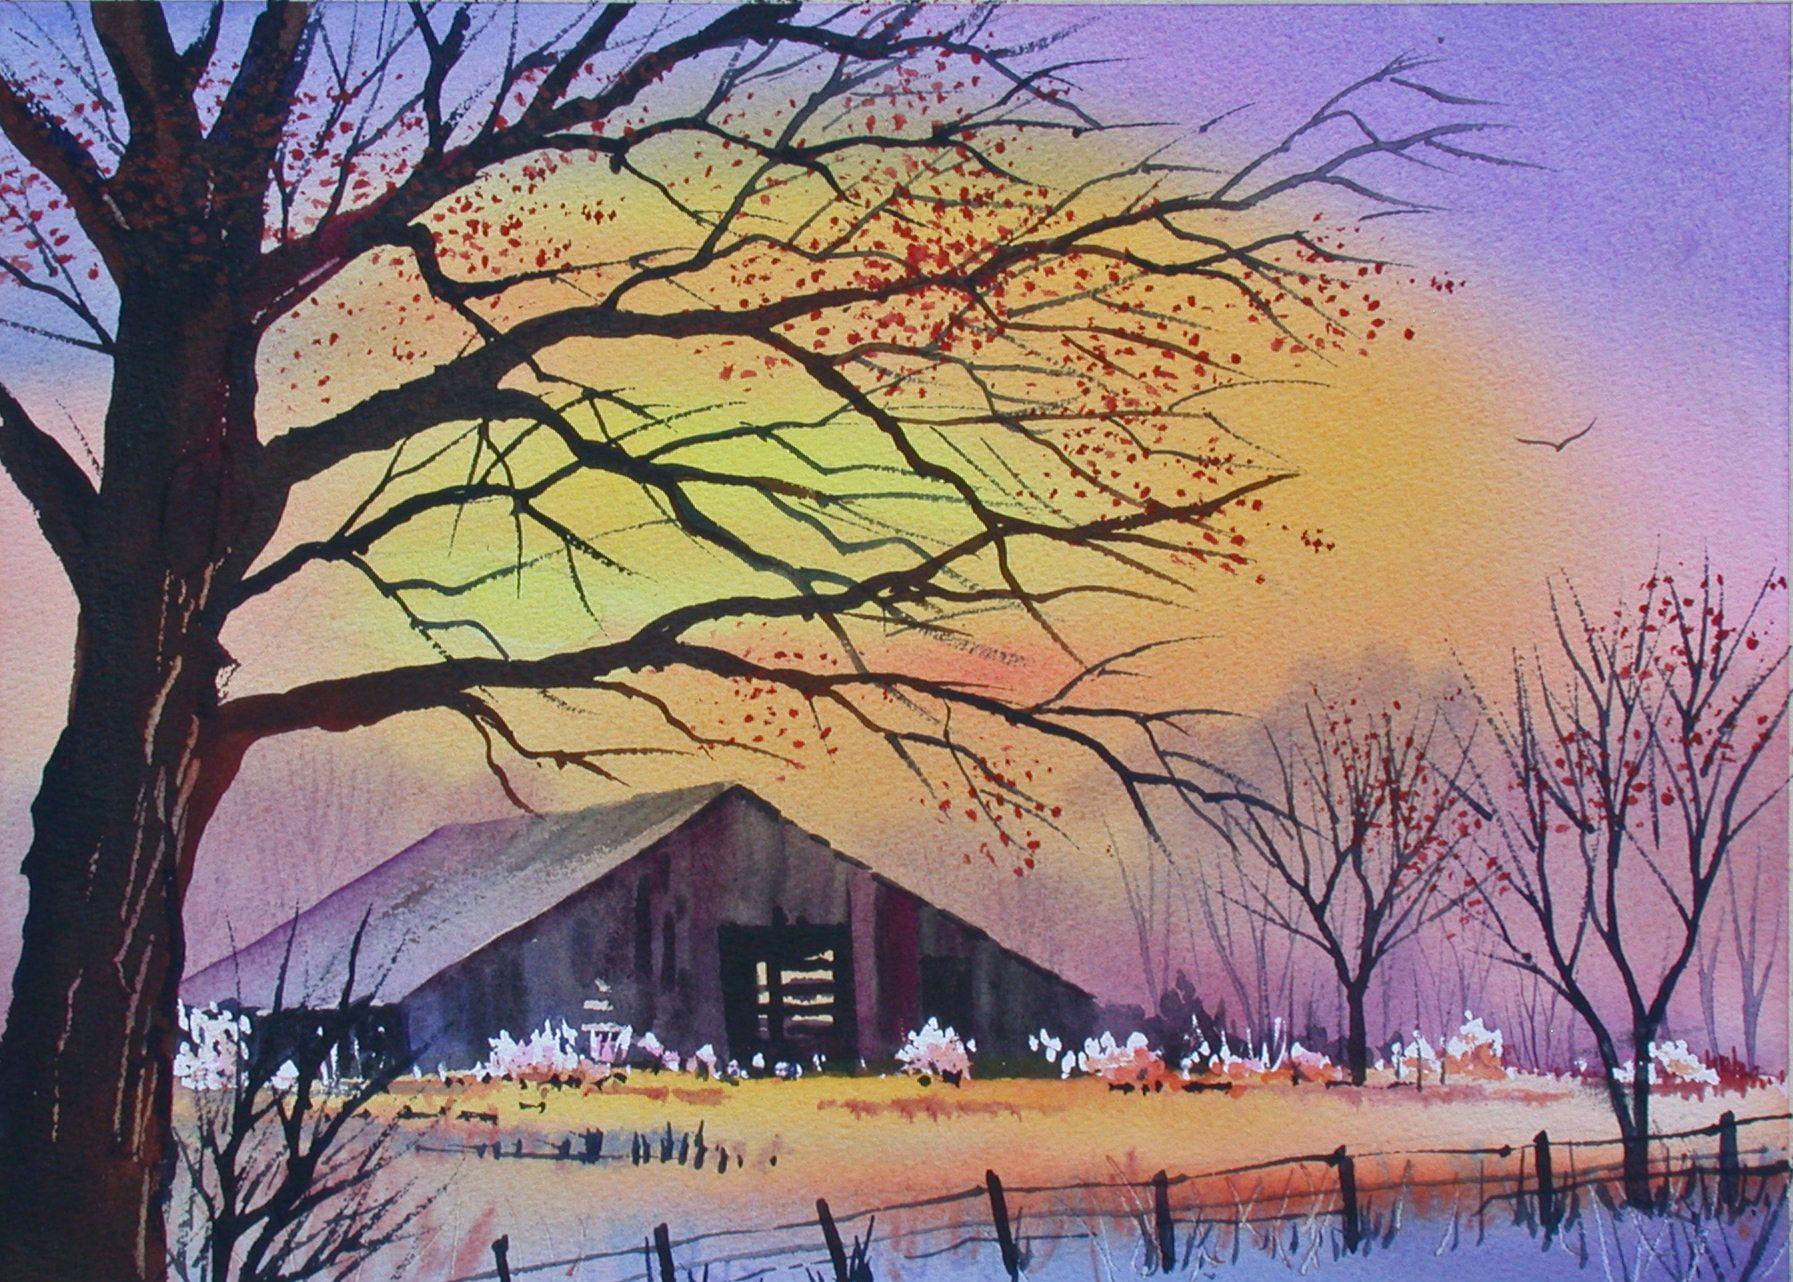 Late Autumn Sunset, 2013, 16x20, $325_edited-3.jpg (1793×1282)